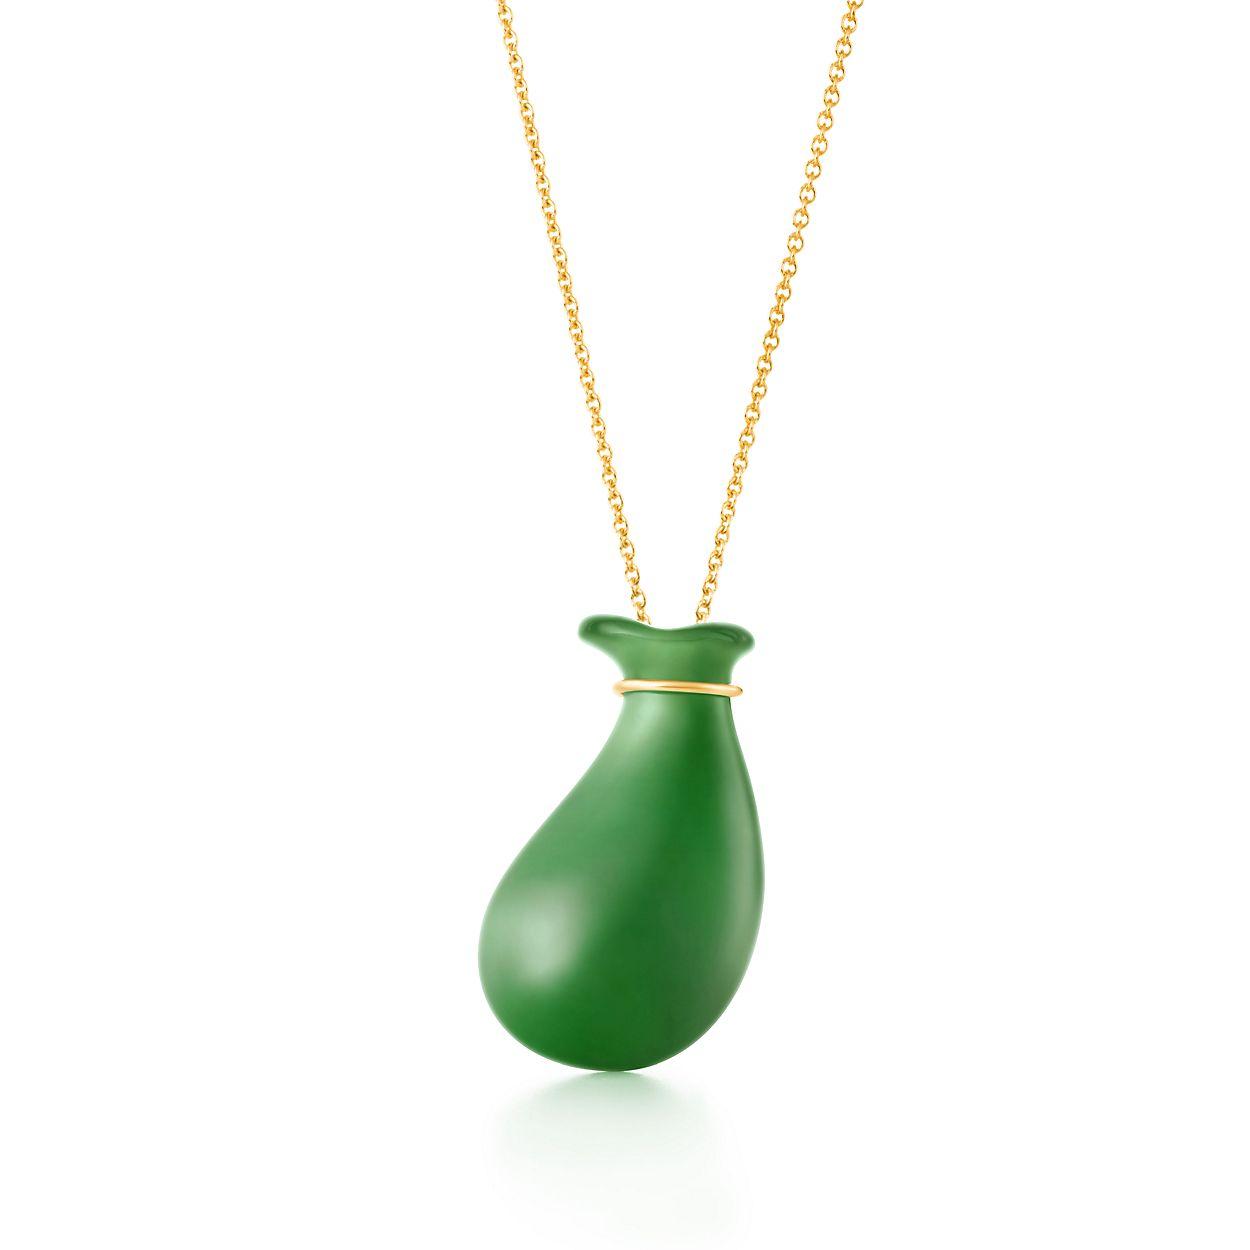 Elsa Peretti Bean earrings in 18k gold and green jade Tiffany & Co. DXsqdCc11